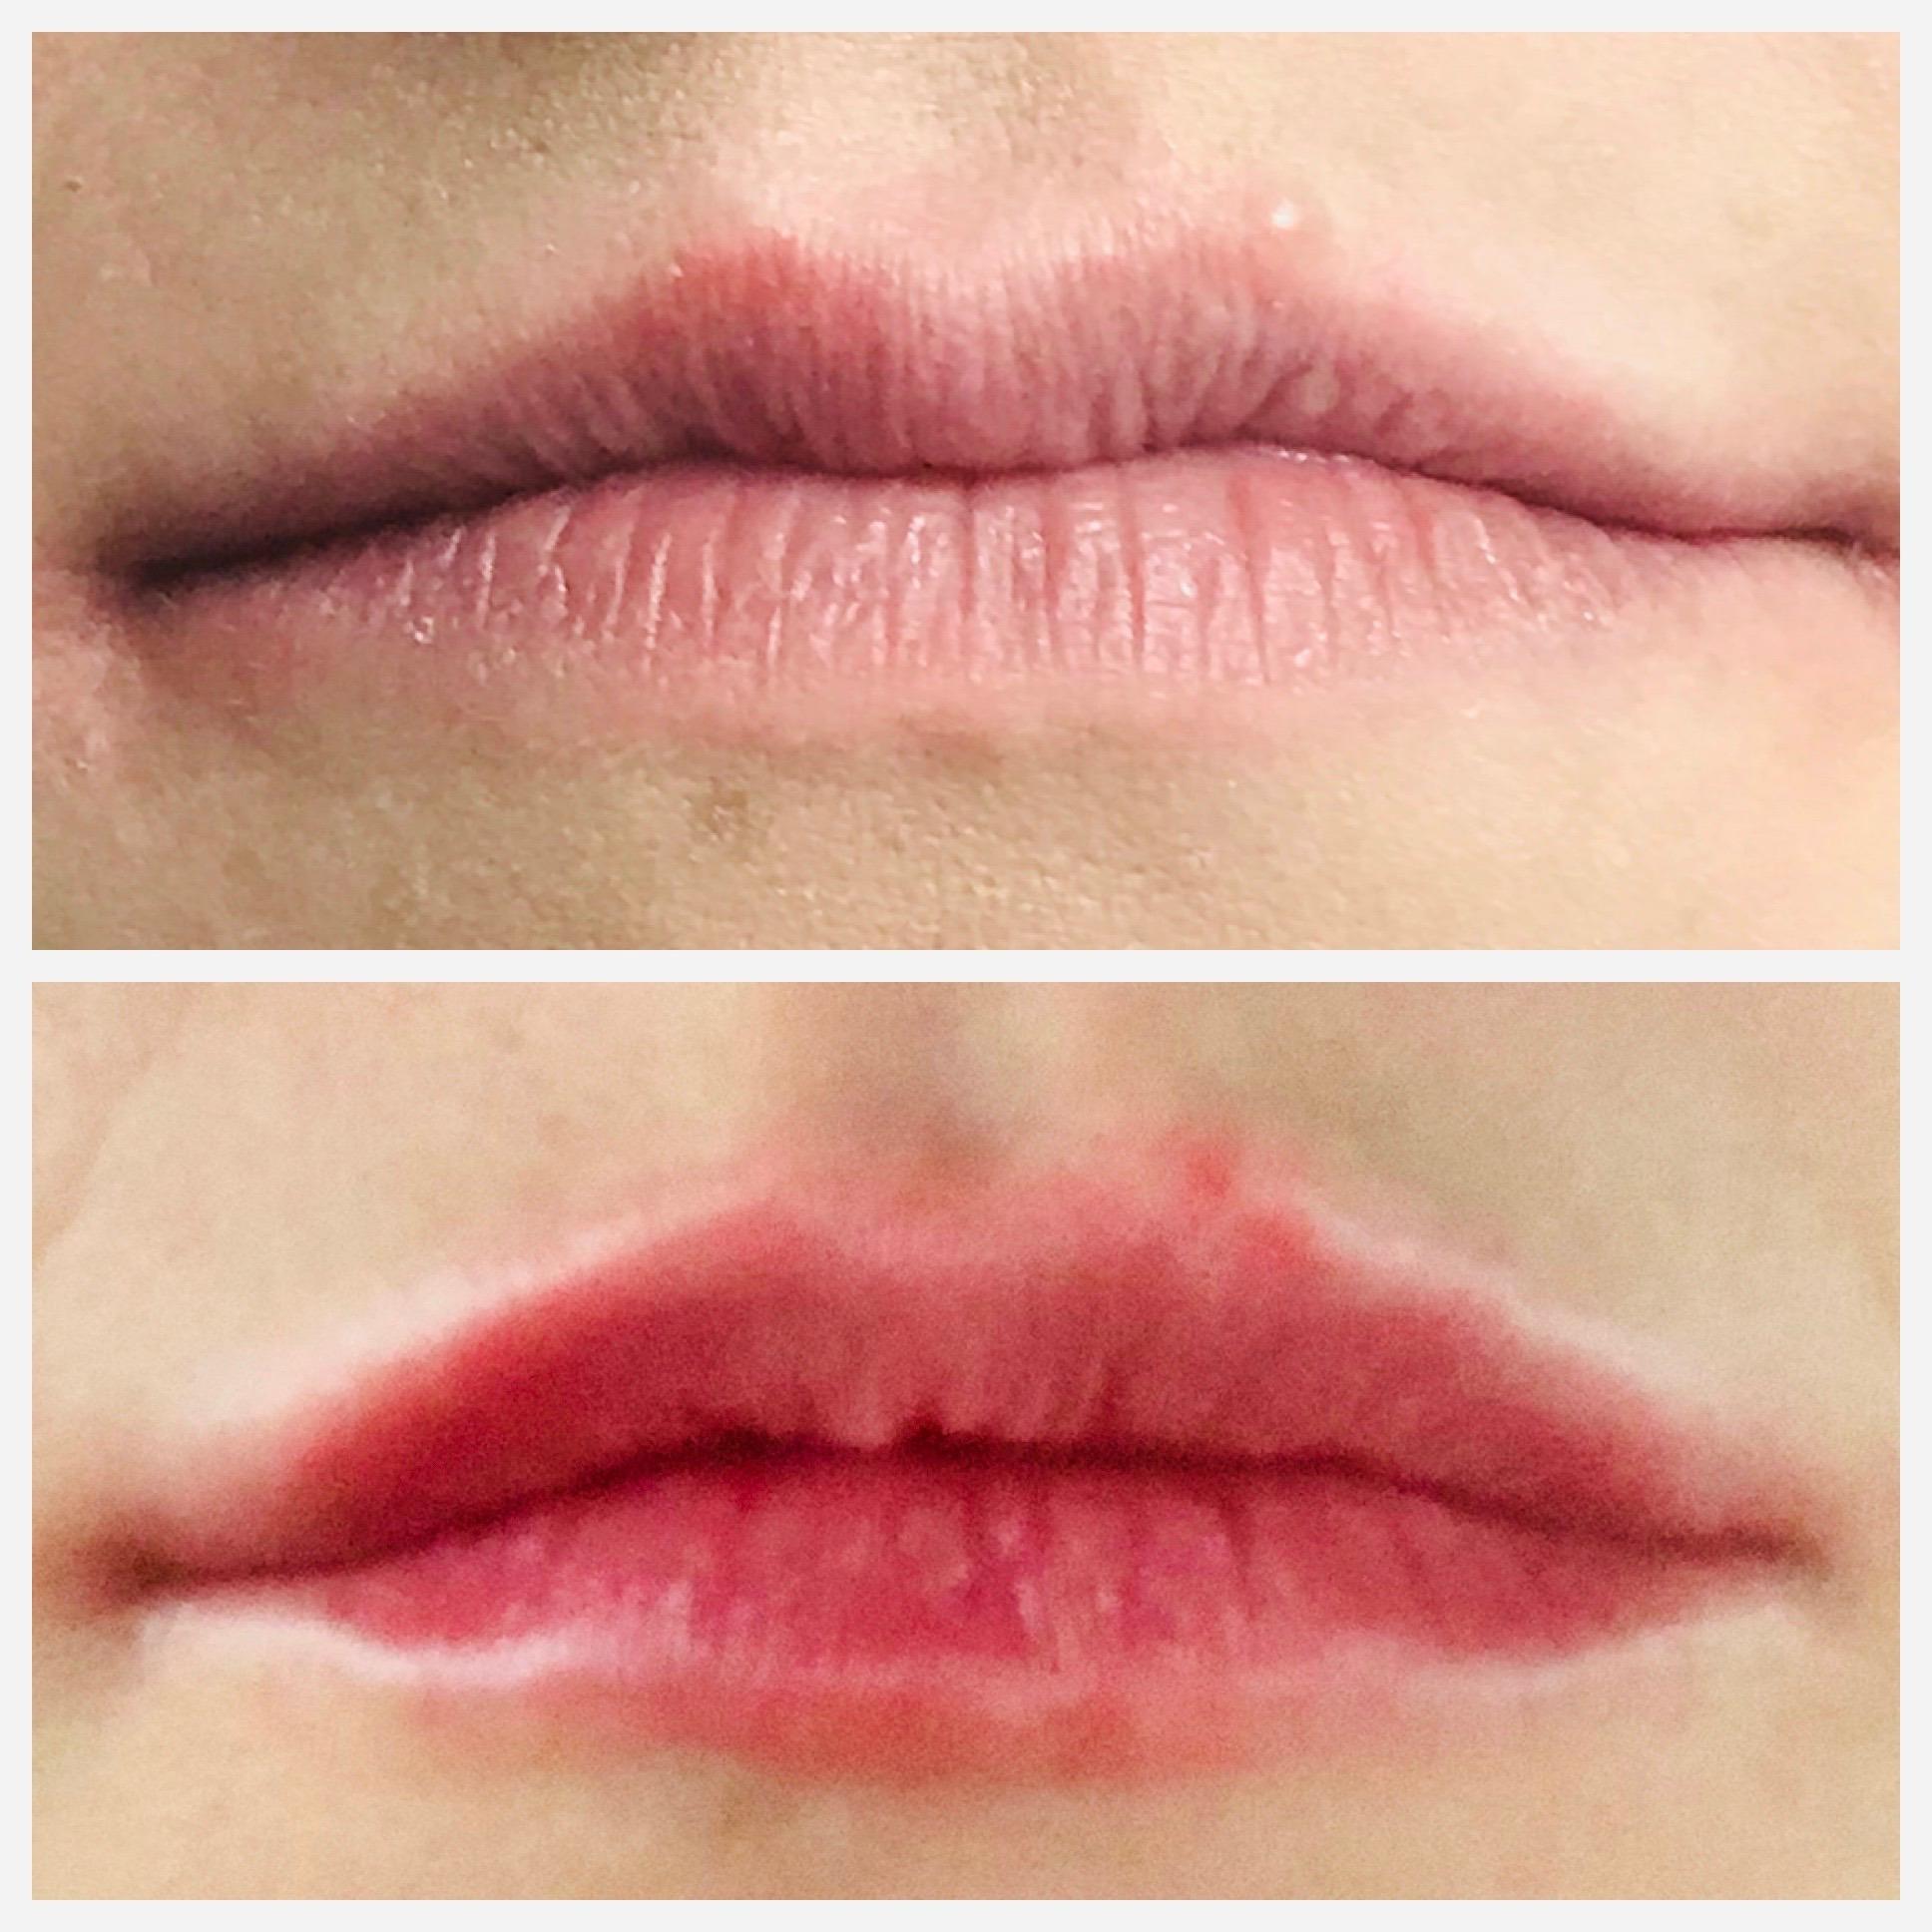 Lips, I syringe Juvederm Vollure